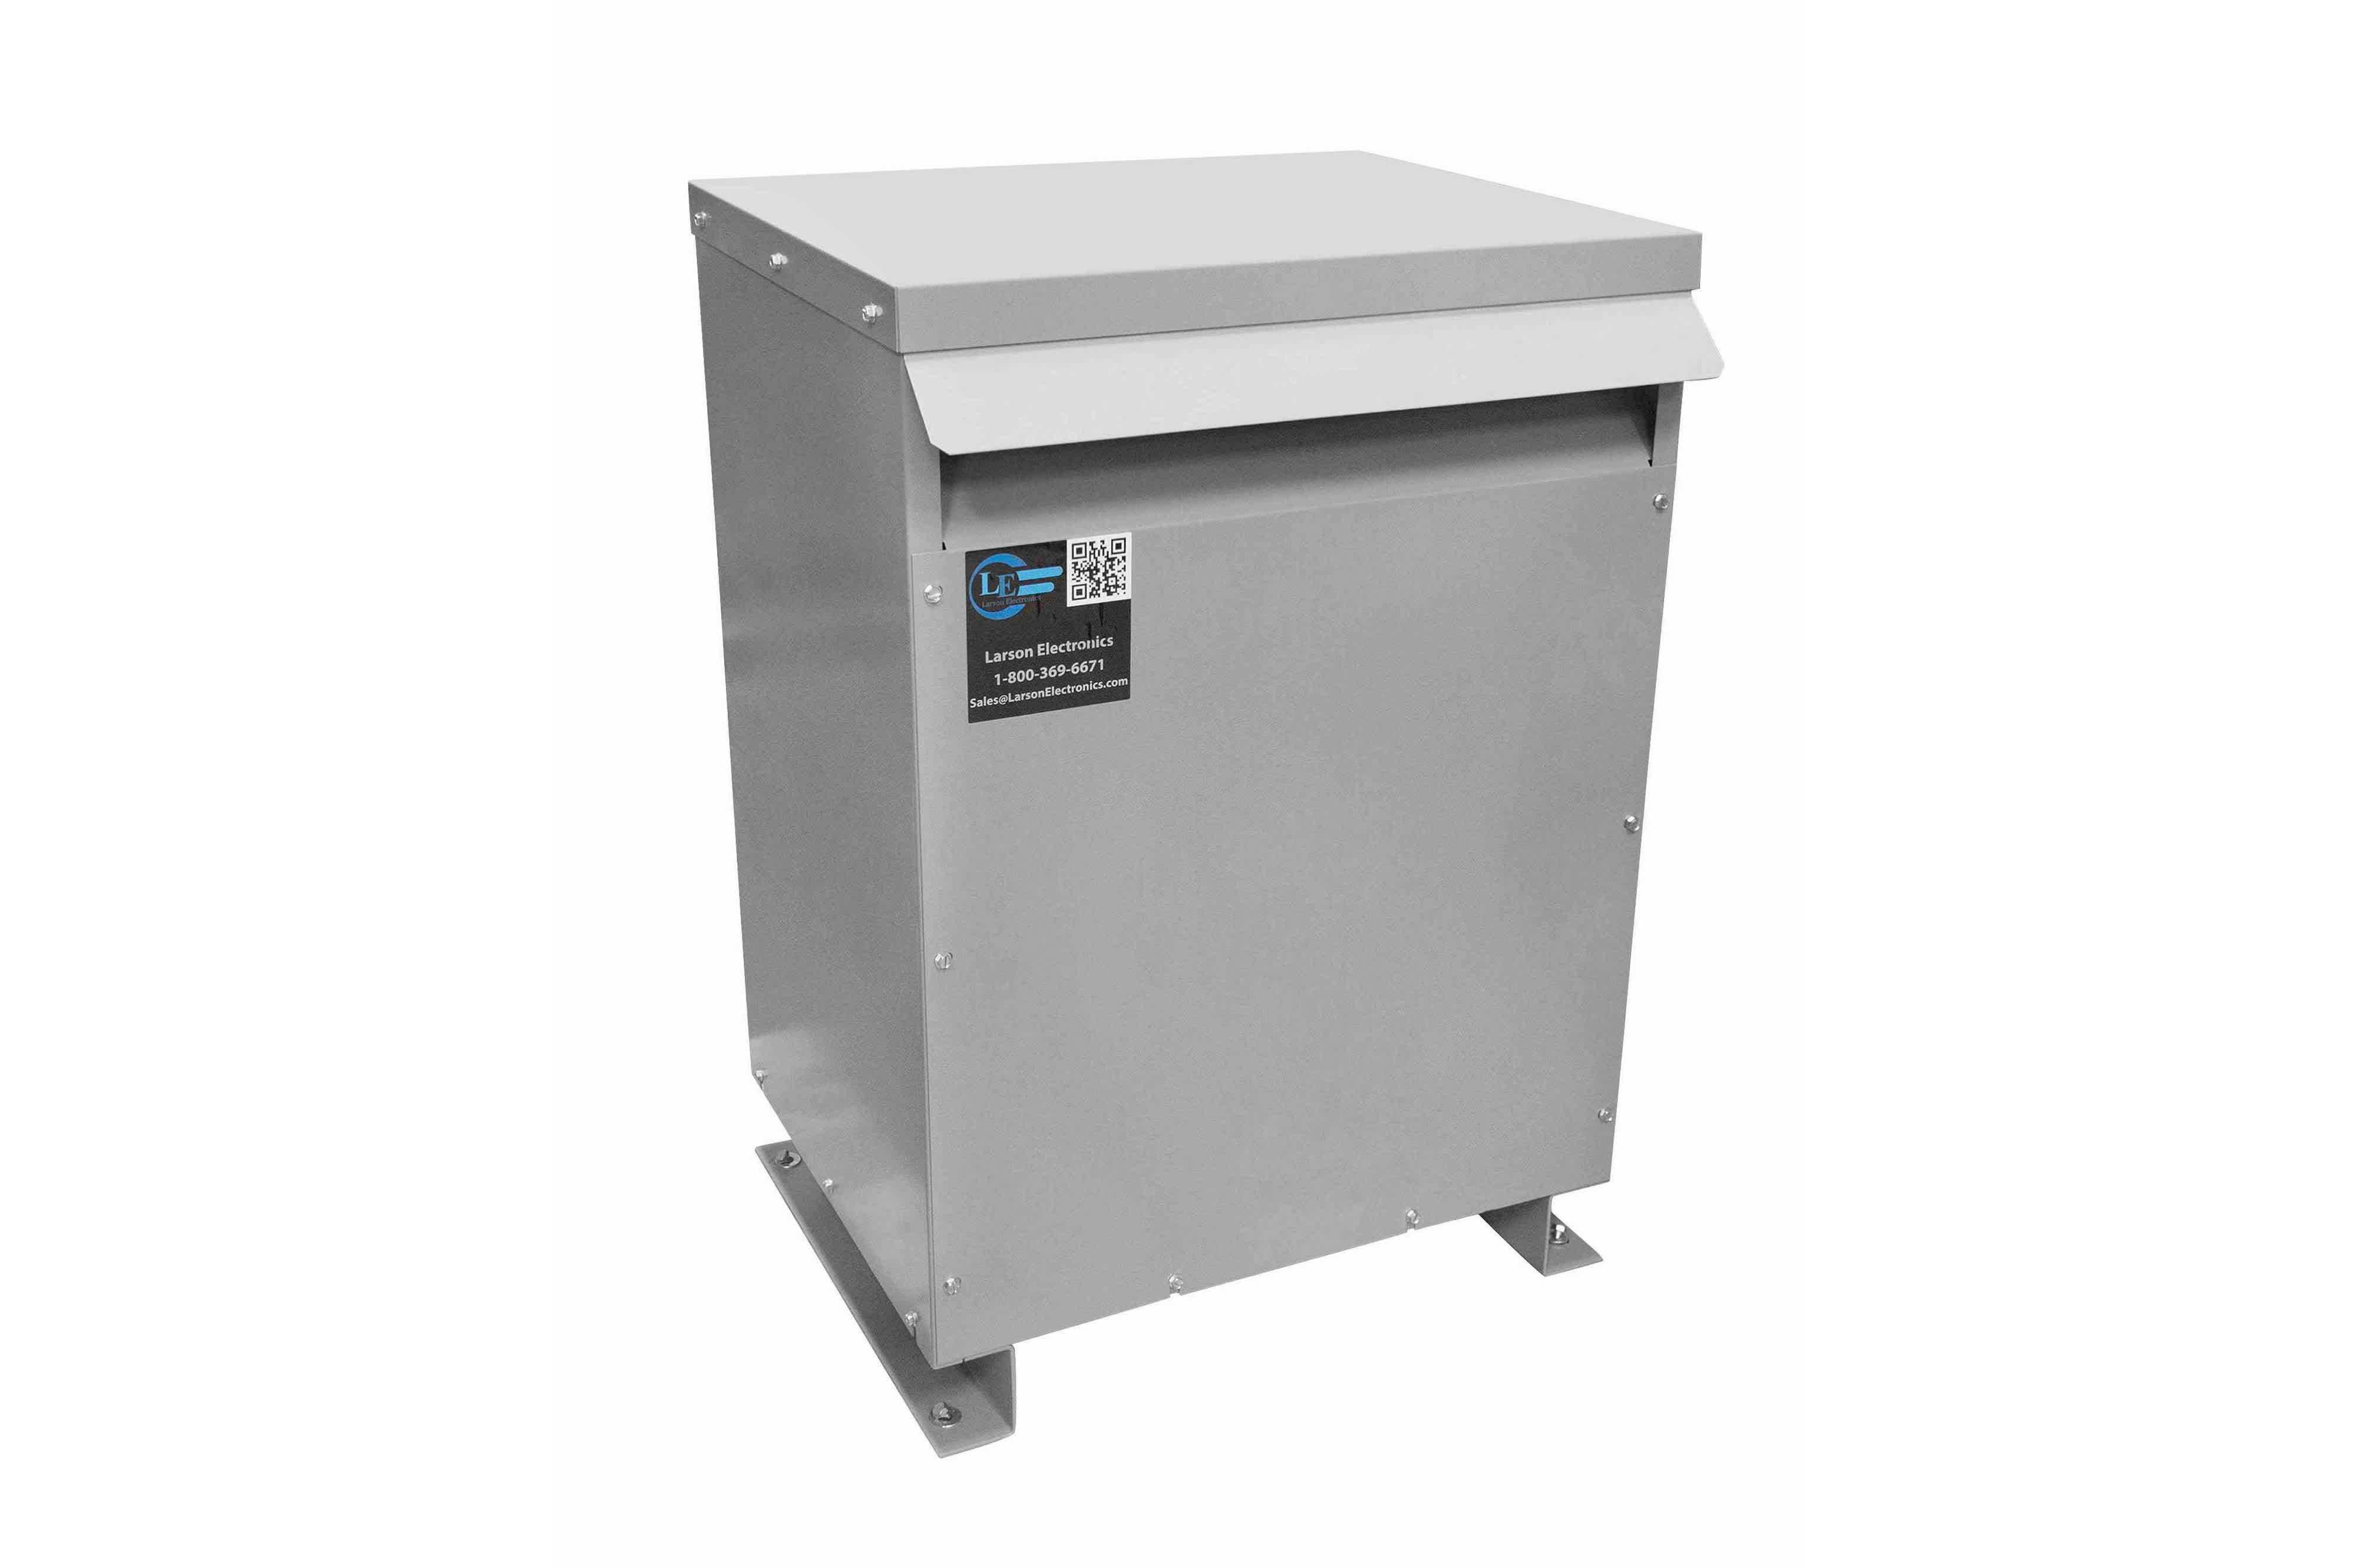 13 kVA 3PH Isolation Transformer, 480V Wye Primary, 380Y/220 Wye-N Secondary, N3R, Ventilated, 60 Hz